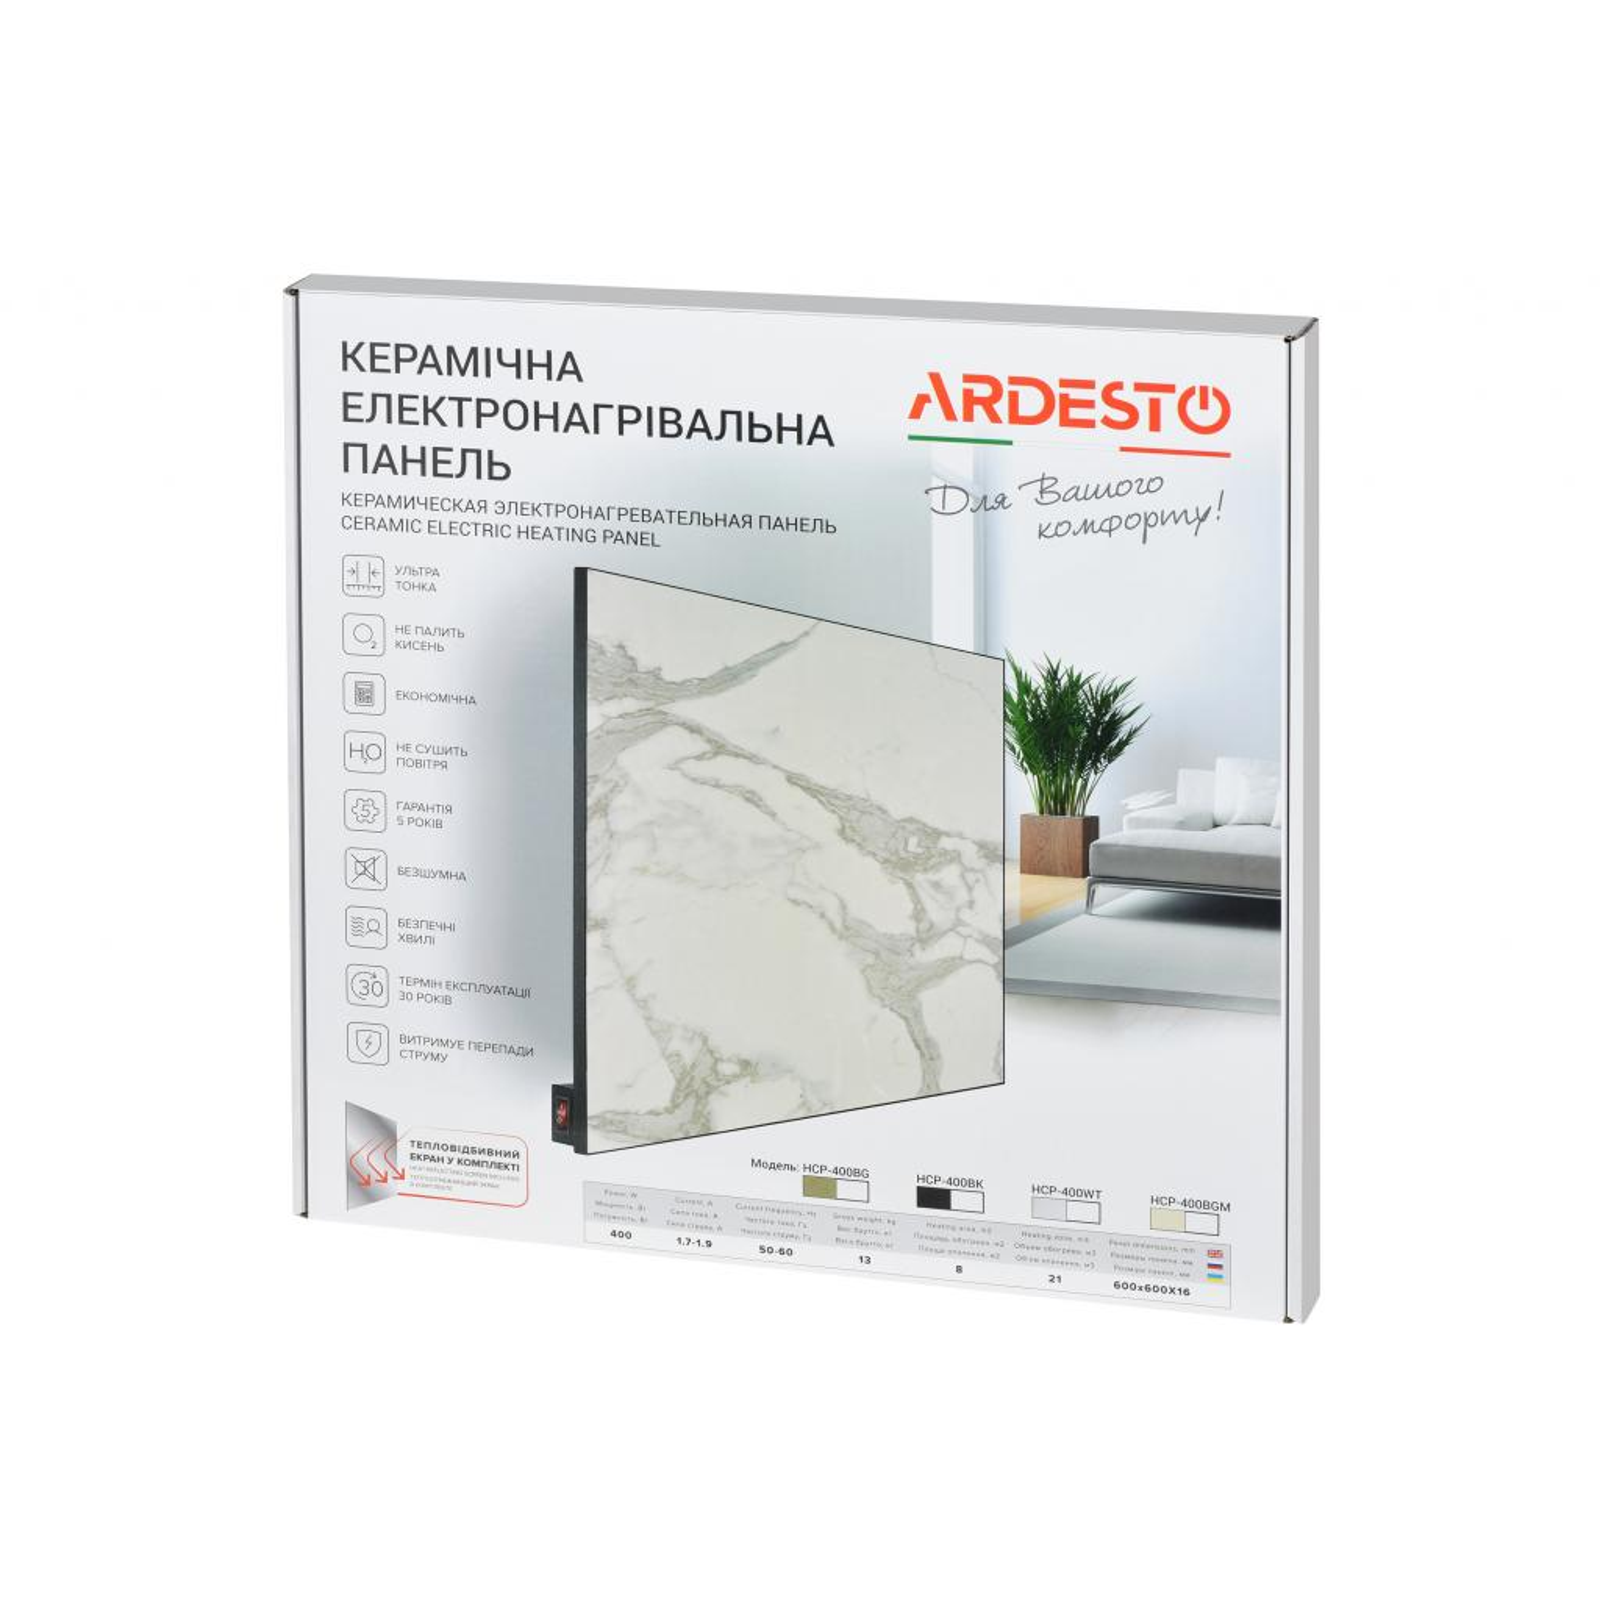 Обігрівач Ardesto HCP-400BG зображення 7